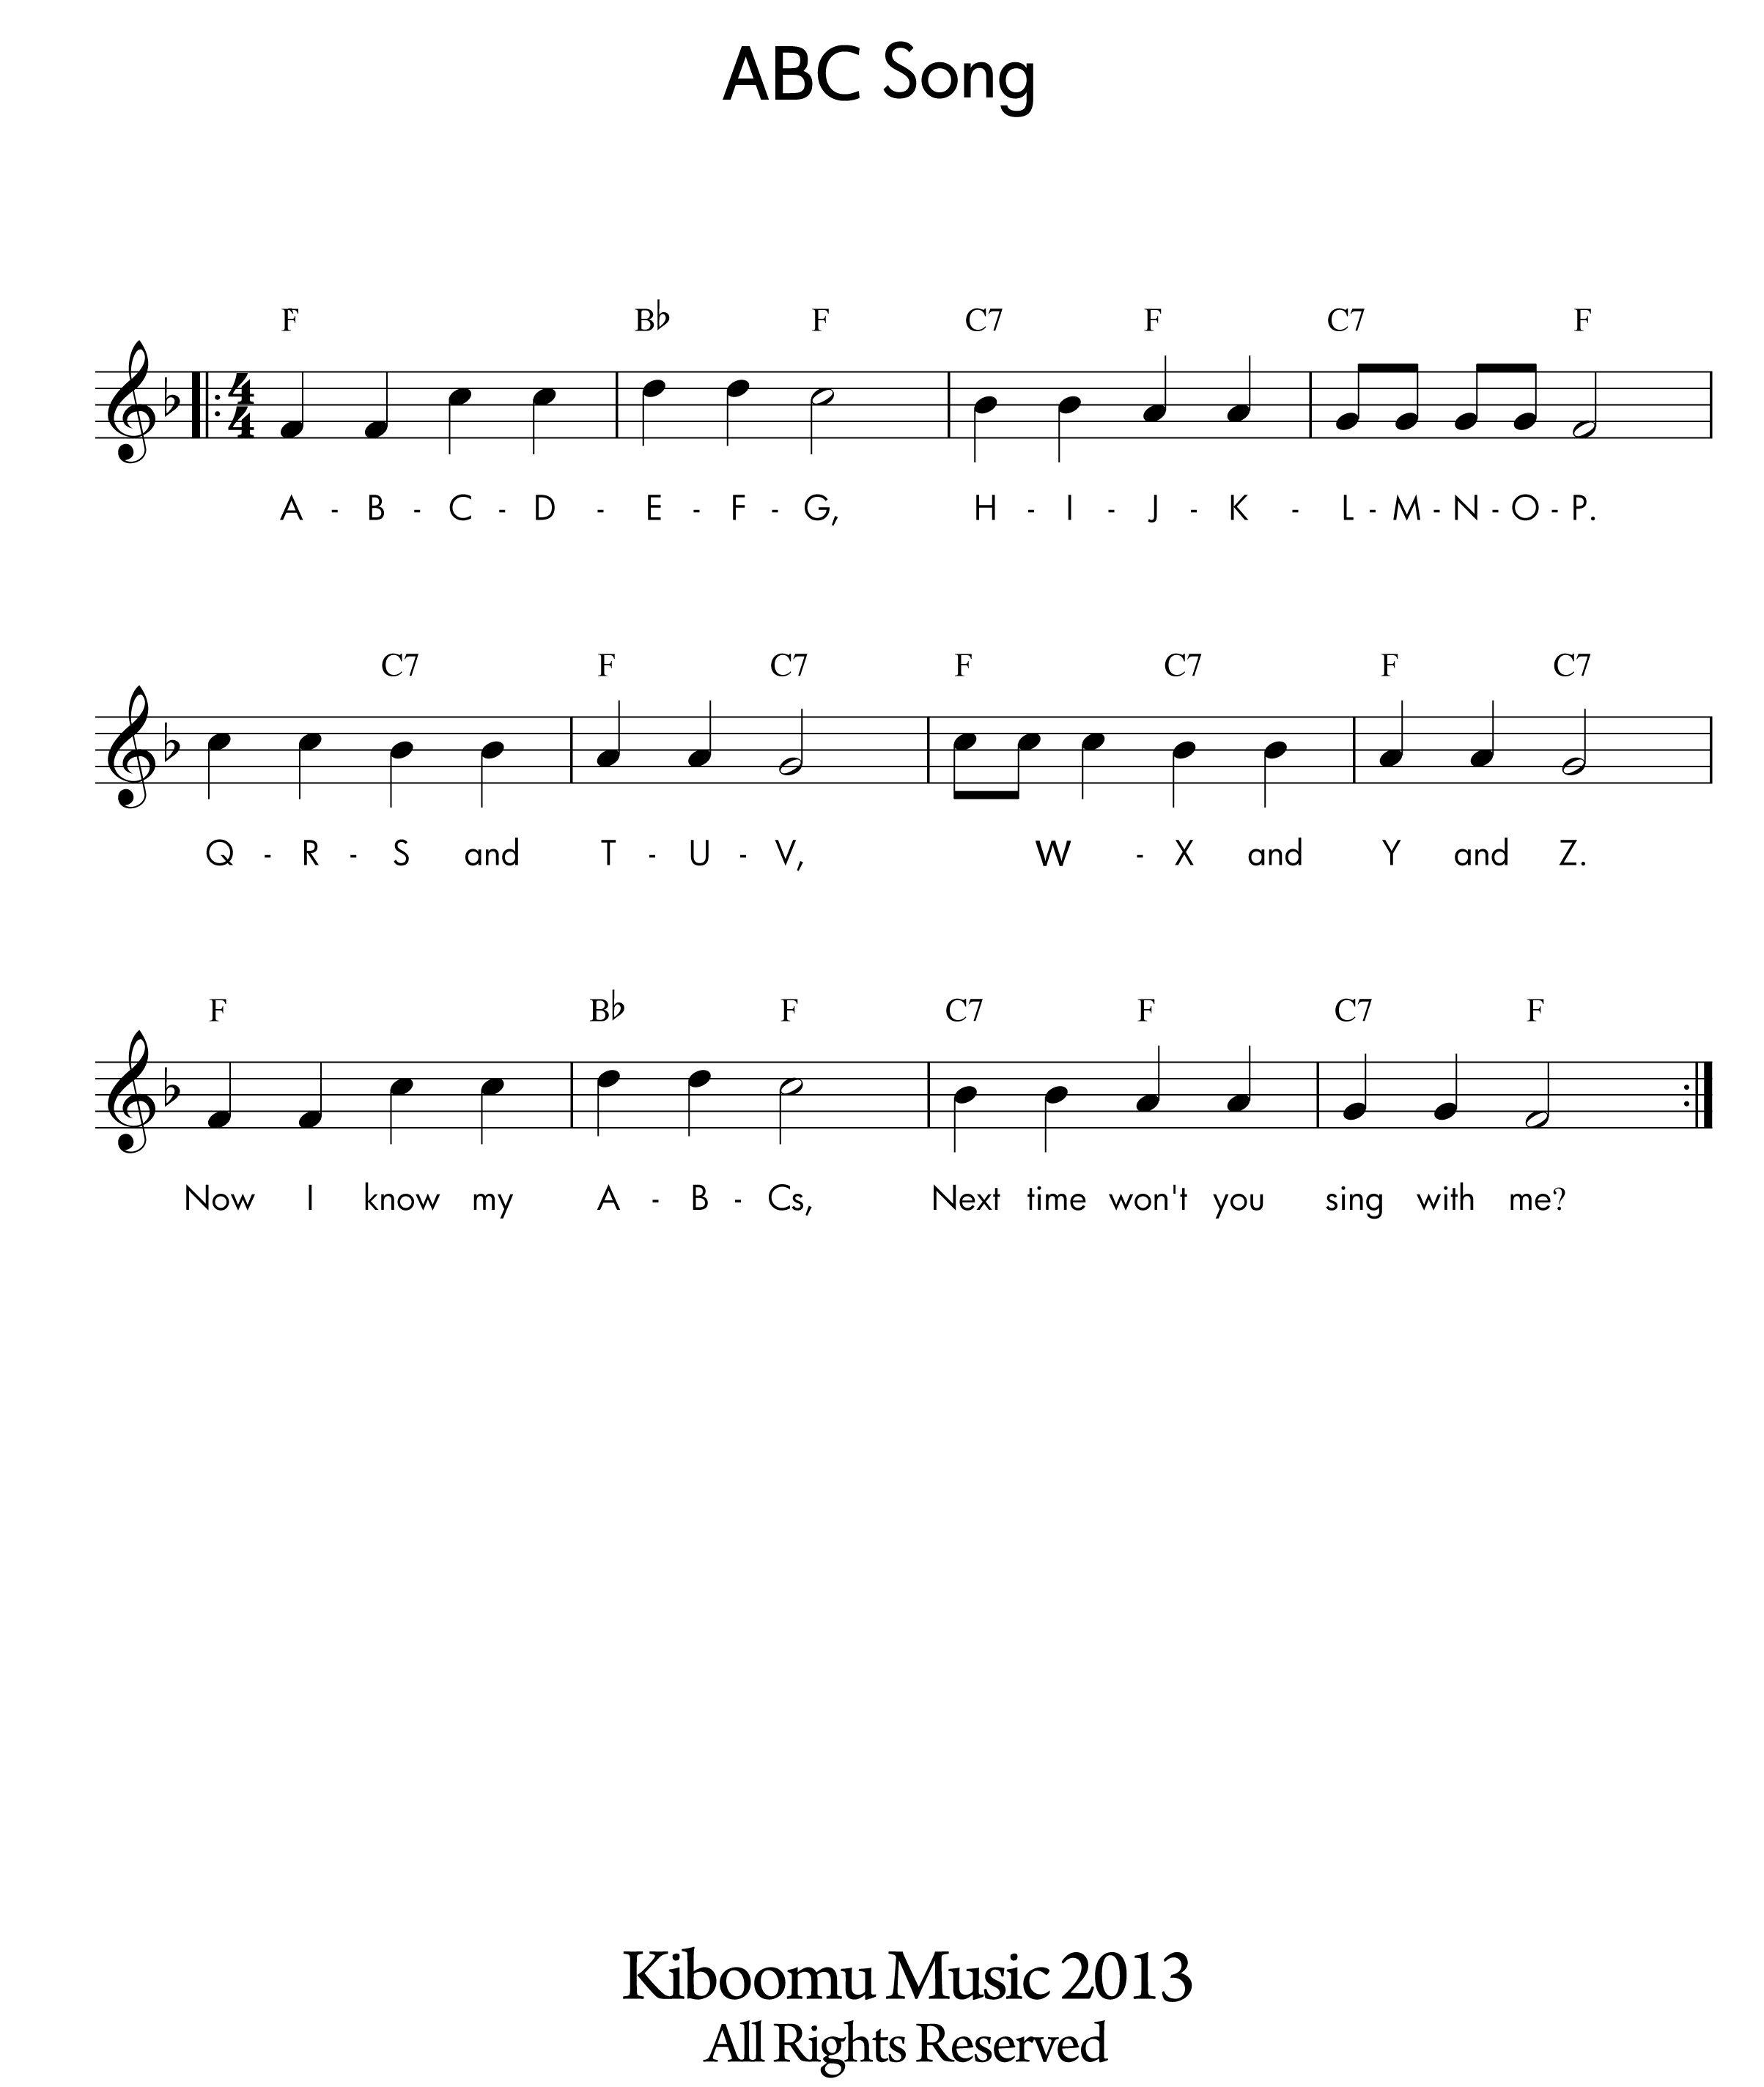 Abc Song Sheet Music At Kiboomu Kids Songs Abc Songs Song Sheet